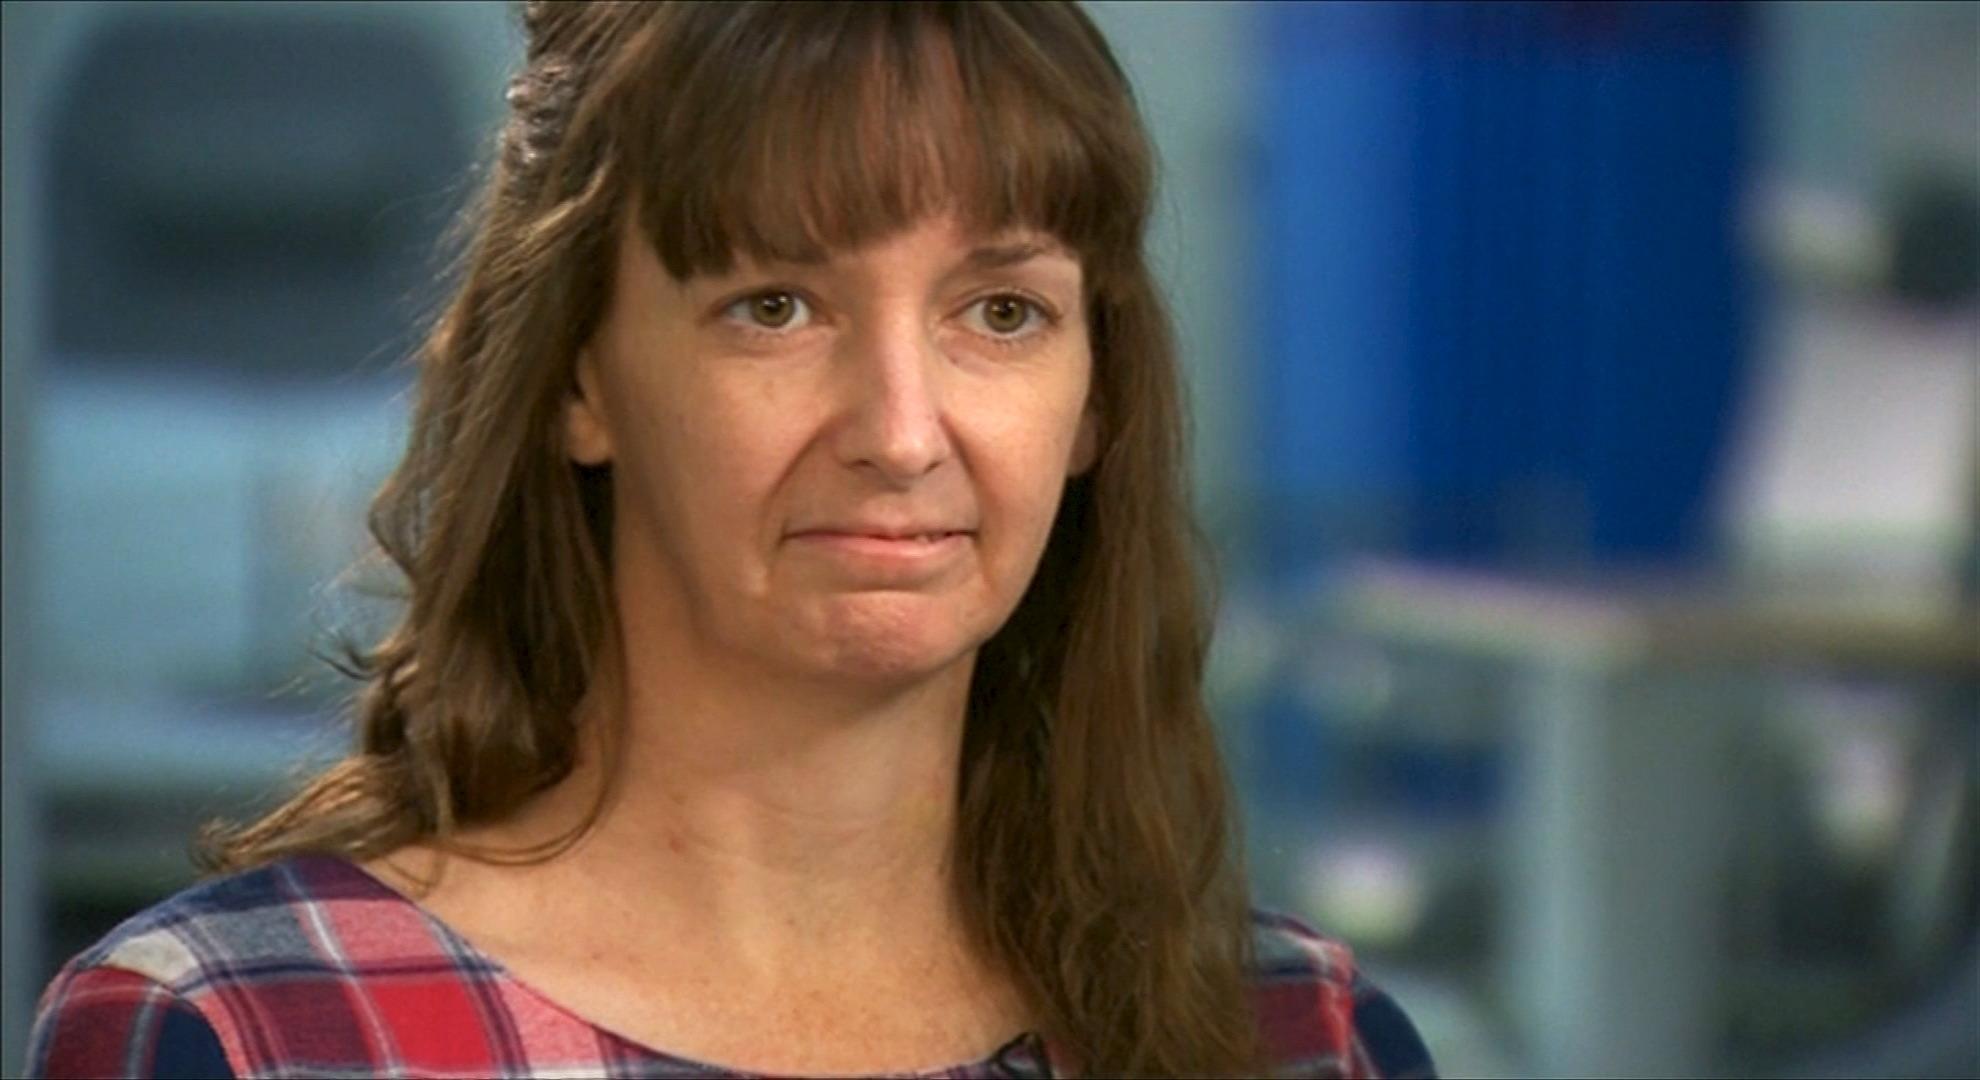 British nurse Pauline Cafferkey speaks during a January 2015 interview in London